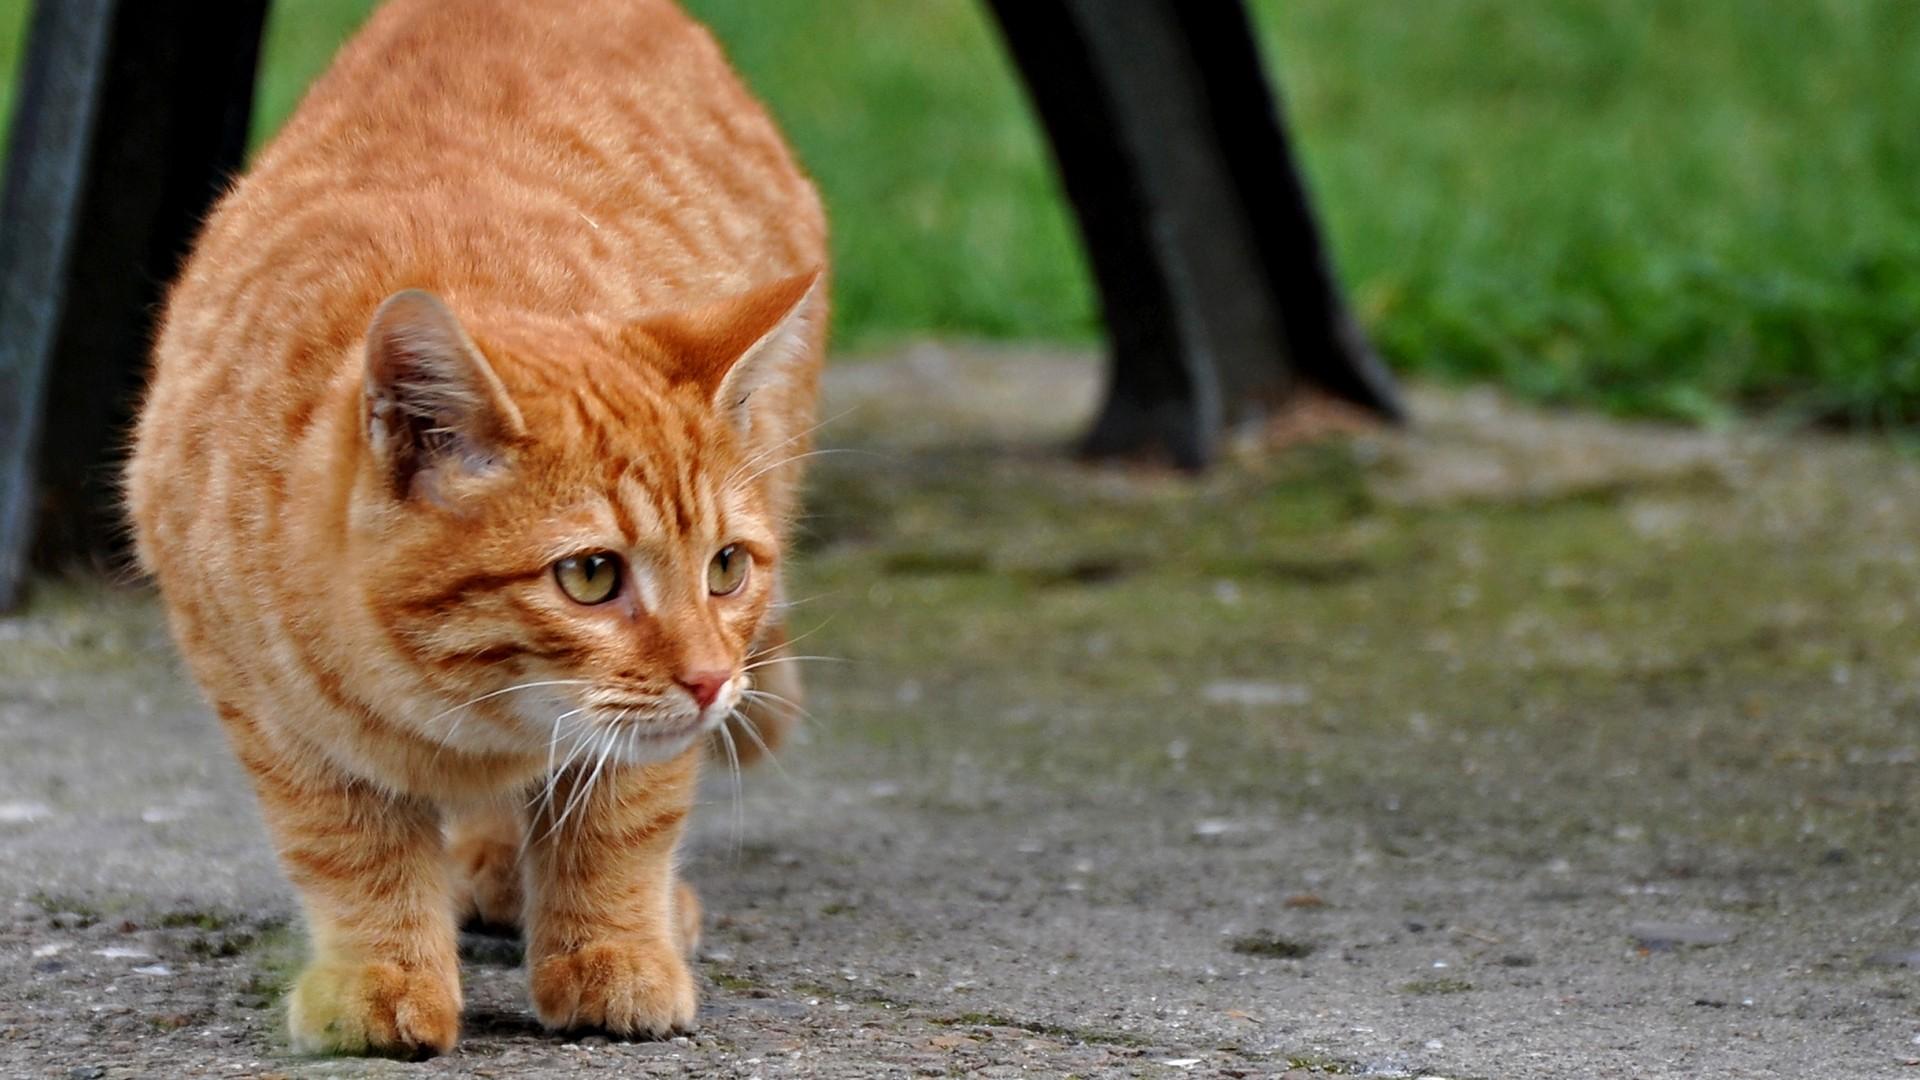 Обои 1920x1080 рыжий кот картинки и обои